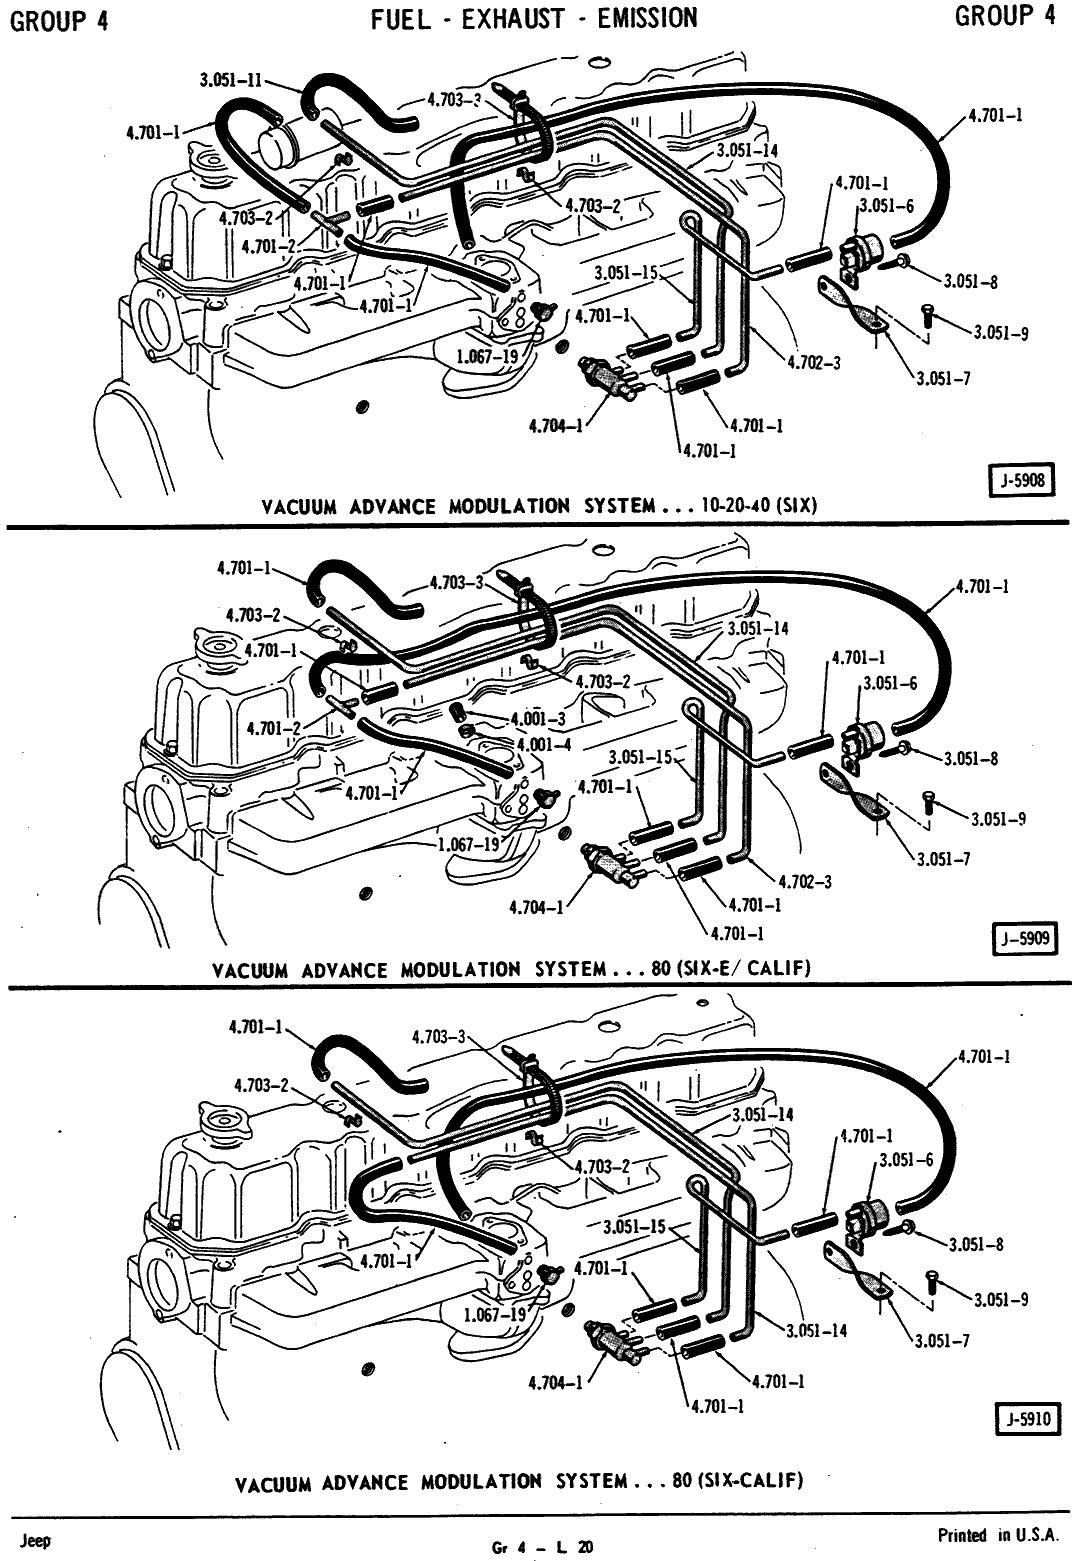 2011 Wrangler Engine Diagram 2009 Mercury Milan Wiring Diagram Keys Can Acces Ab17 Jeanjaures37 Fr